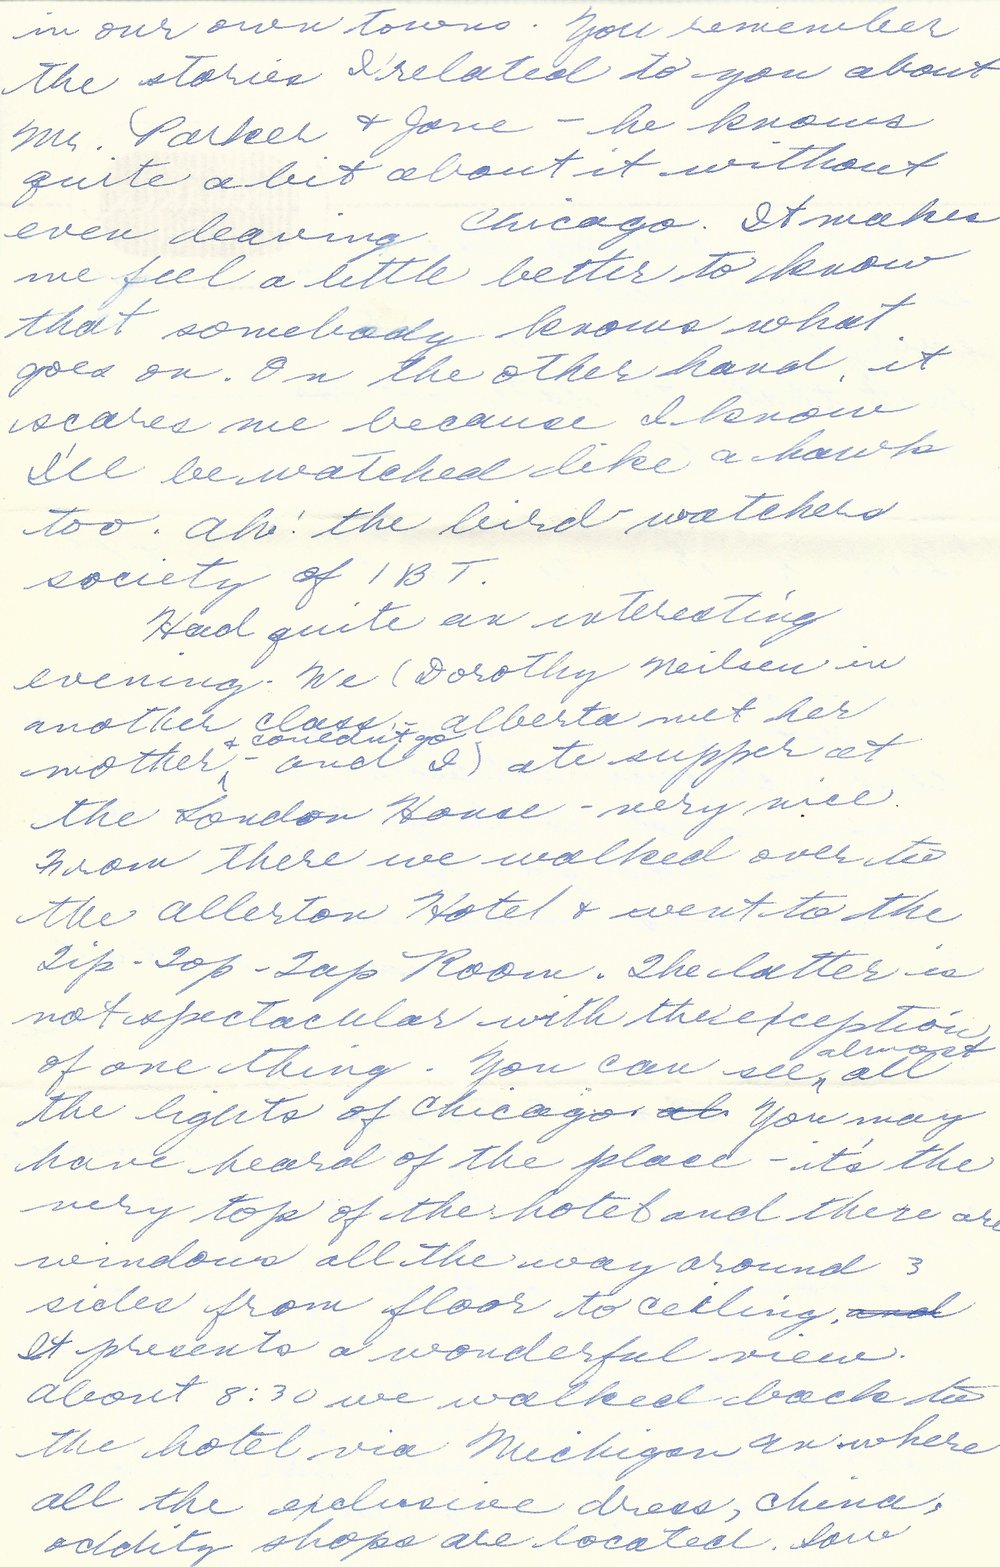 7. Oct. 9-21, 1952 (Oma)_Page_13.jpg